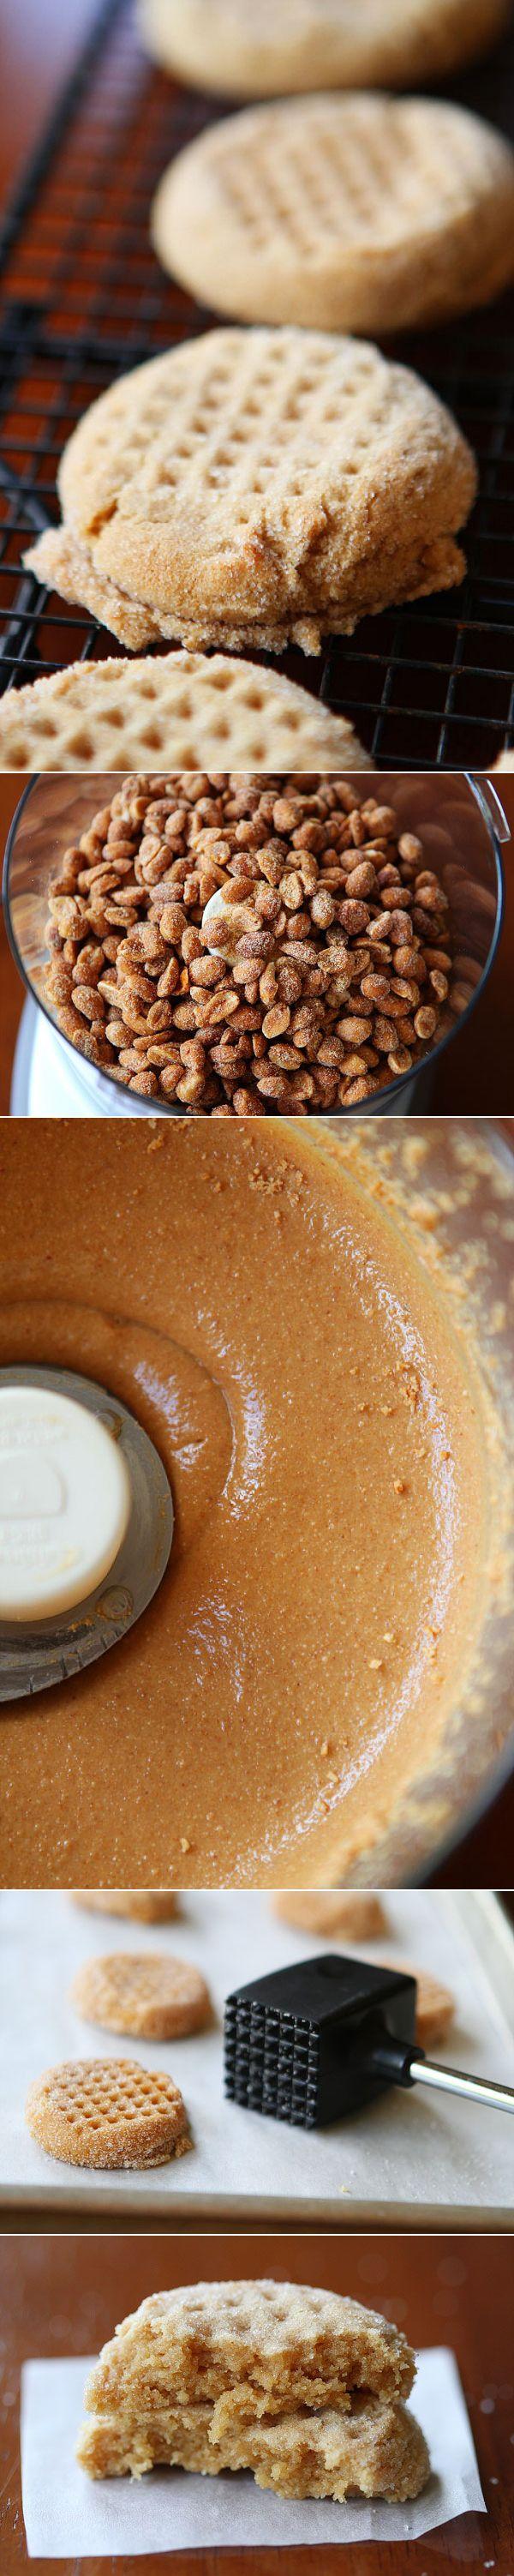 Homemade Honey Roasted Peanut Butter Cookies.